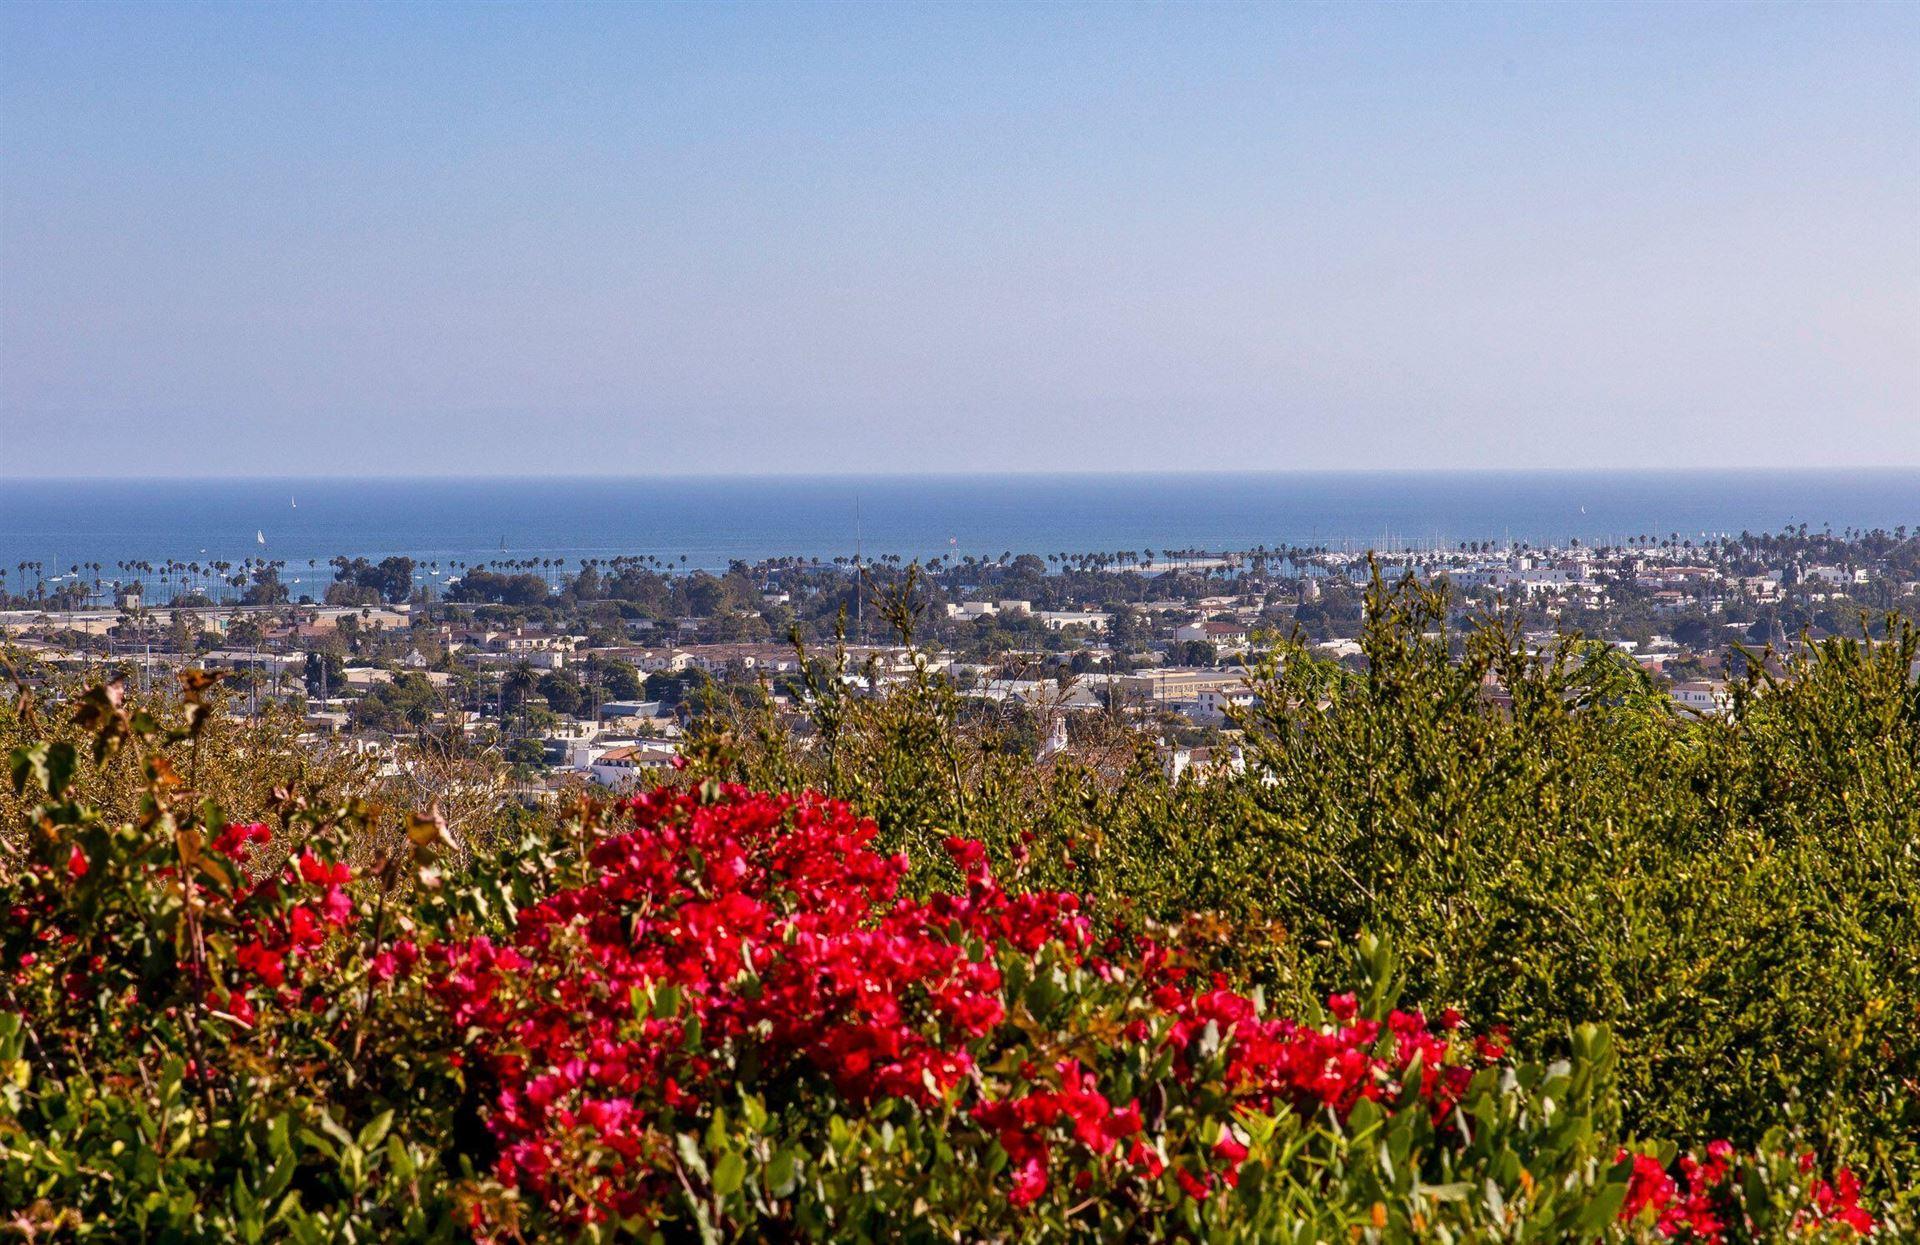 1260 Ferrelo Rd, Santa Barbara, CA 93103 - MLS#: 21-3540